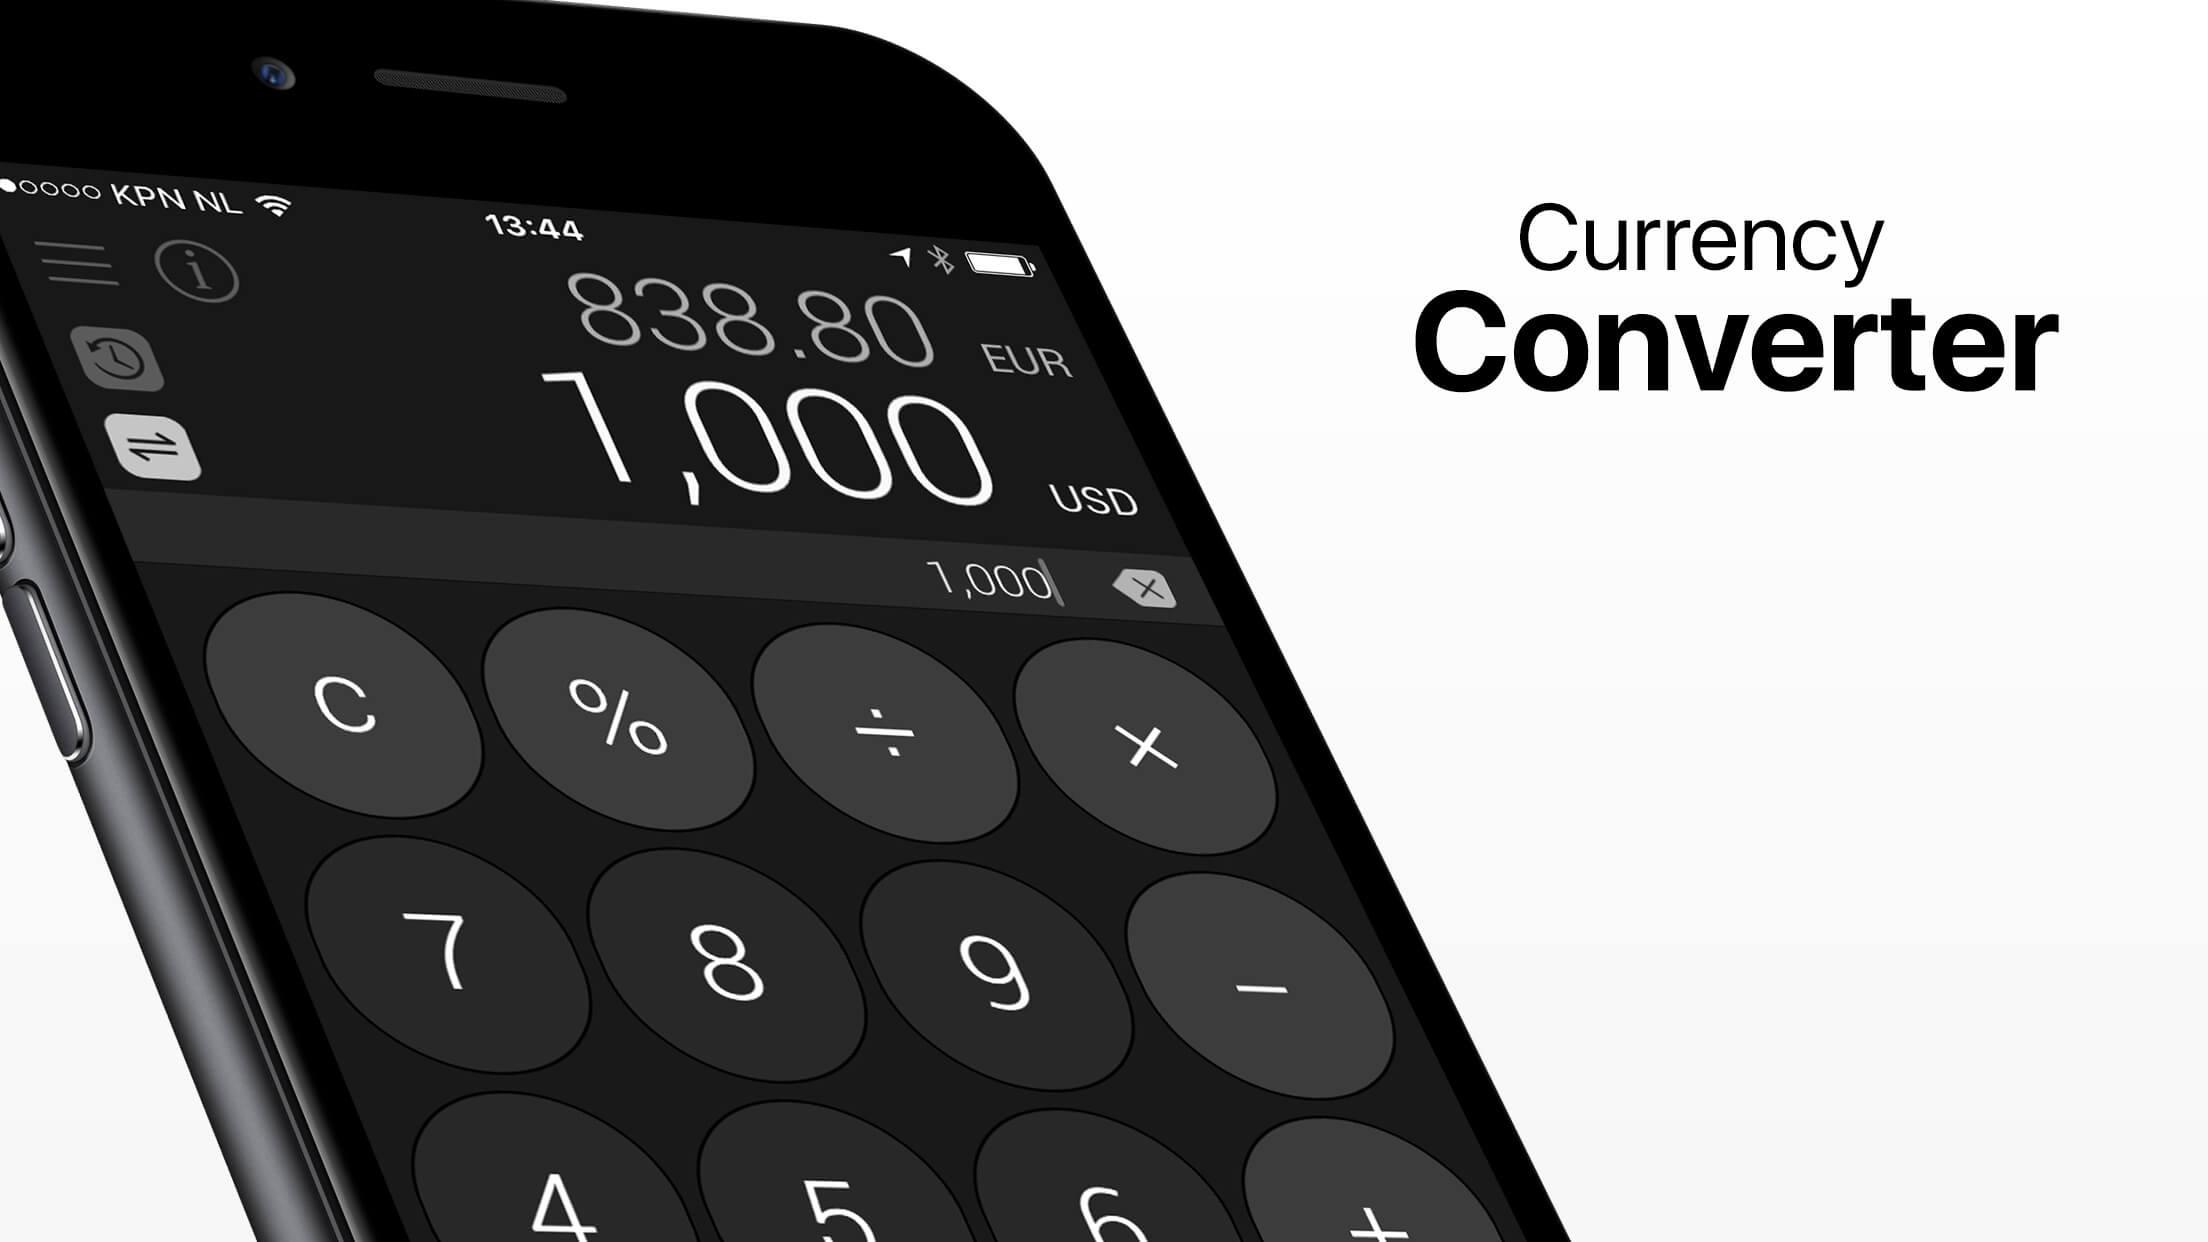 The Calculator Screenshot